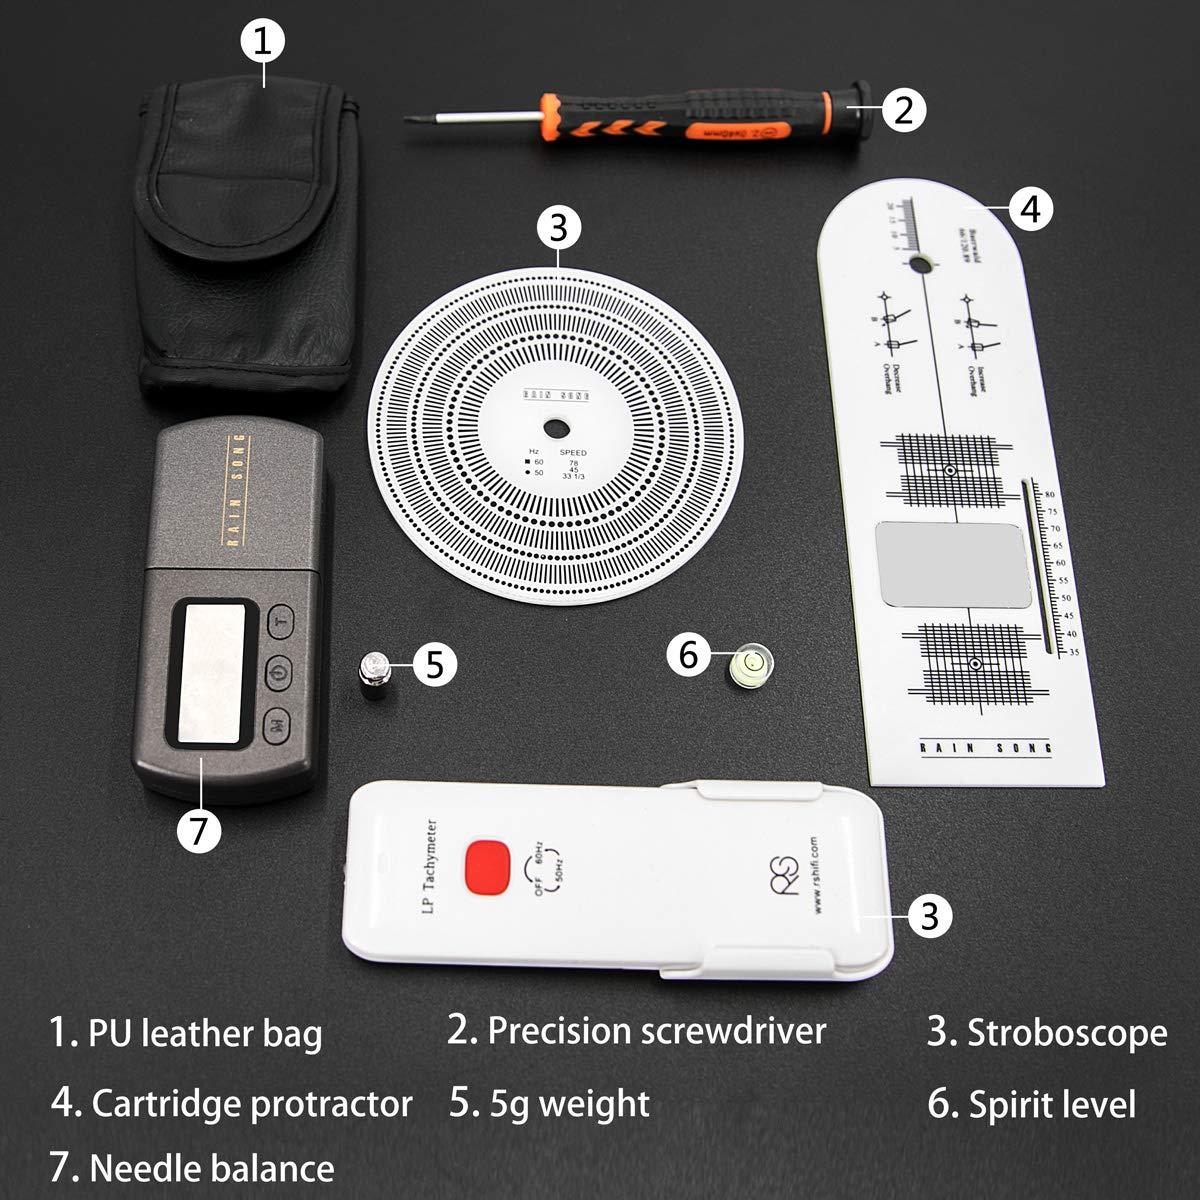 MPK Turntables Adjustment Tool Kits Professional HiFi Turntable Scale Stylus Cartridge Alignment Protractor Tools.